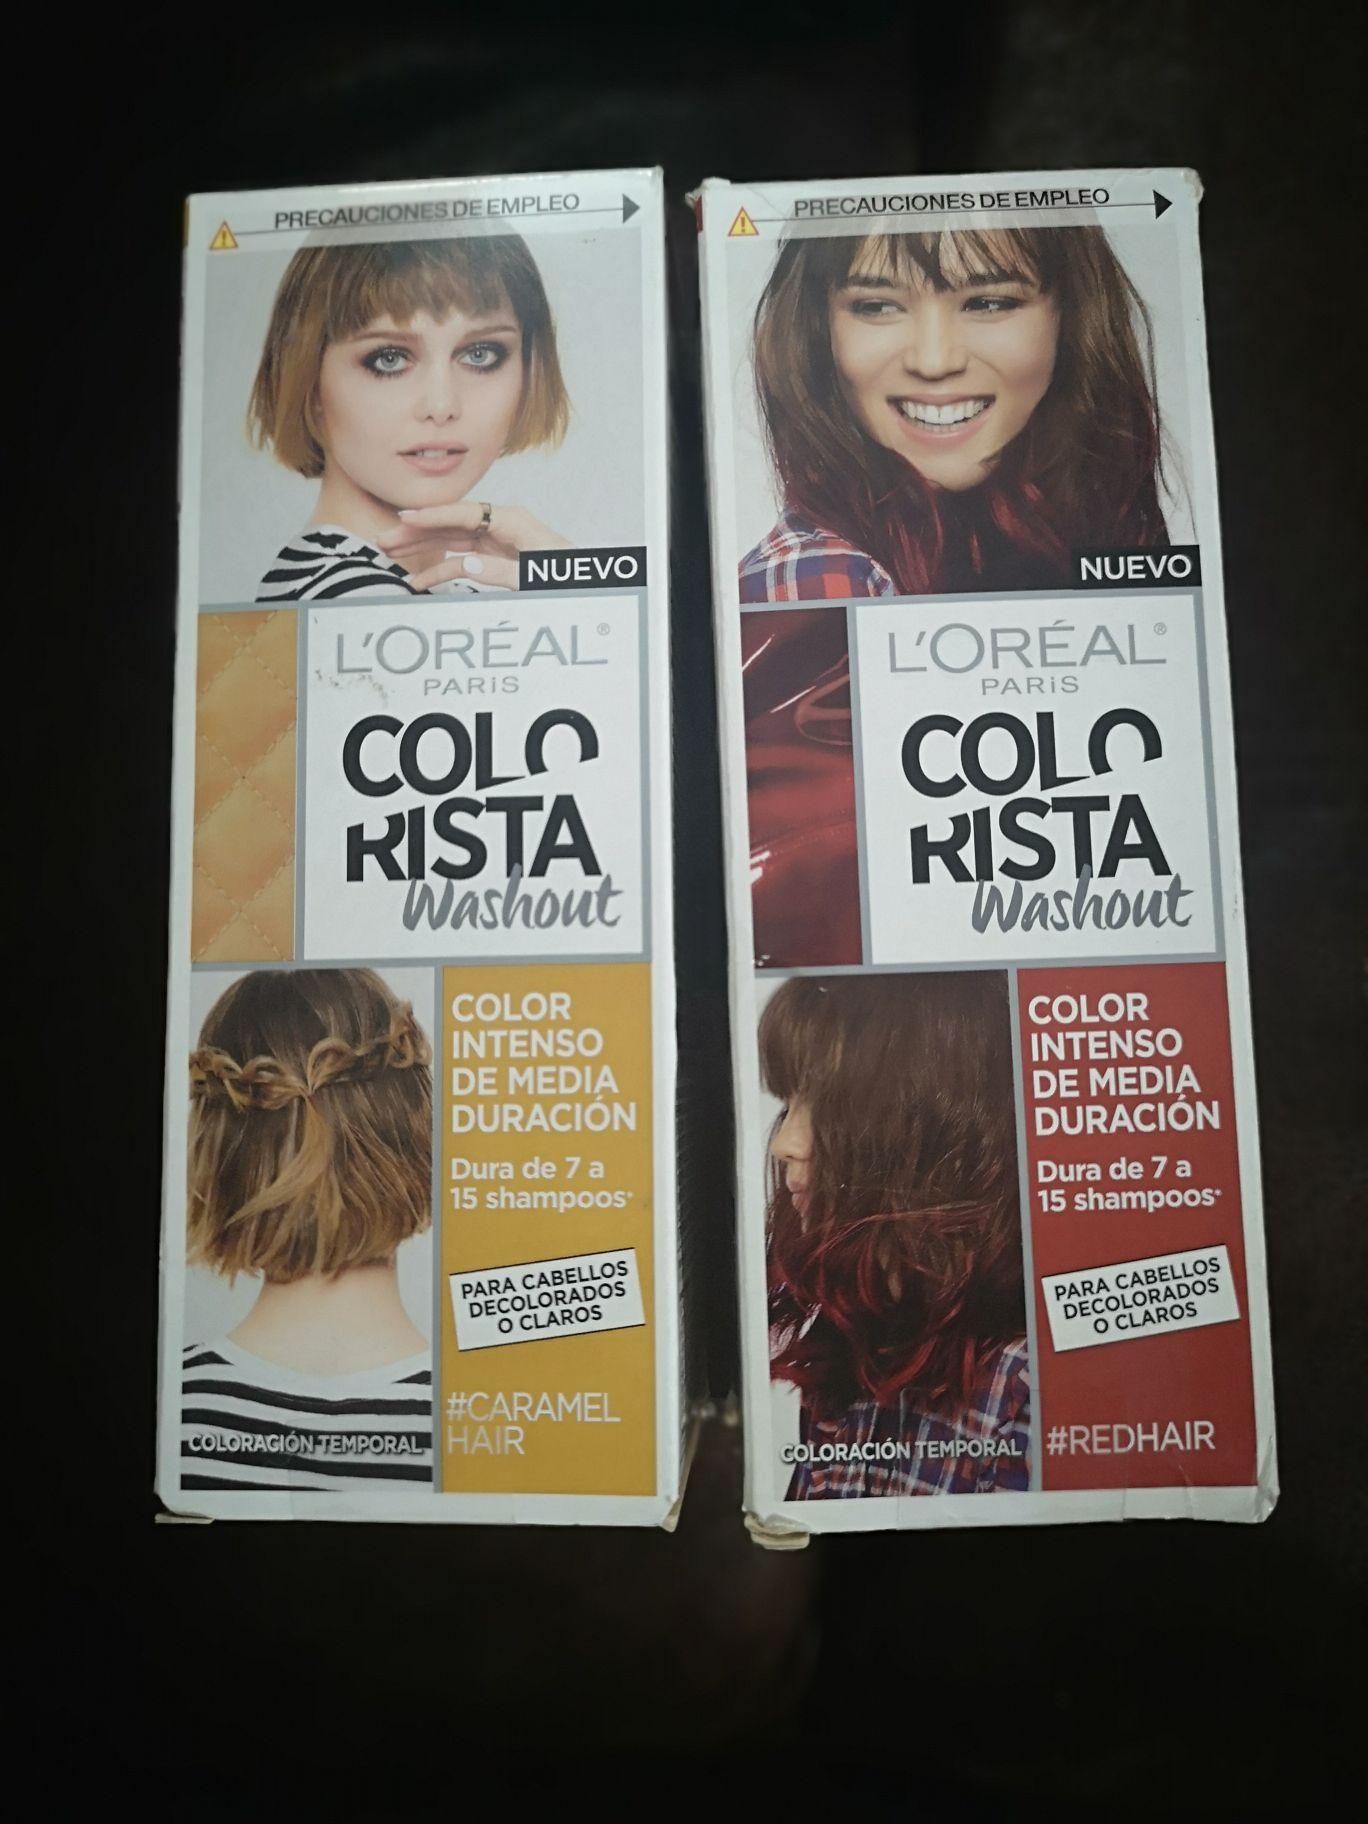 Bodega Aurrera: tinte colorista a 20 pesos